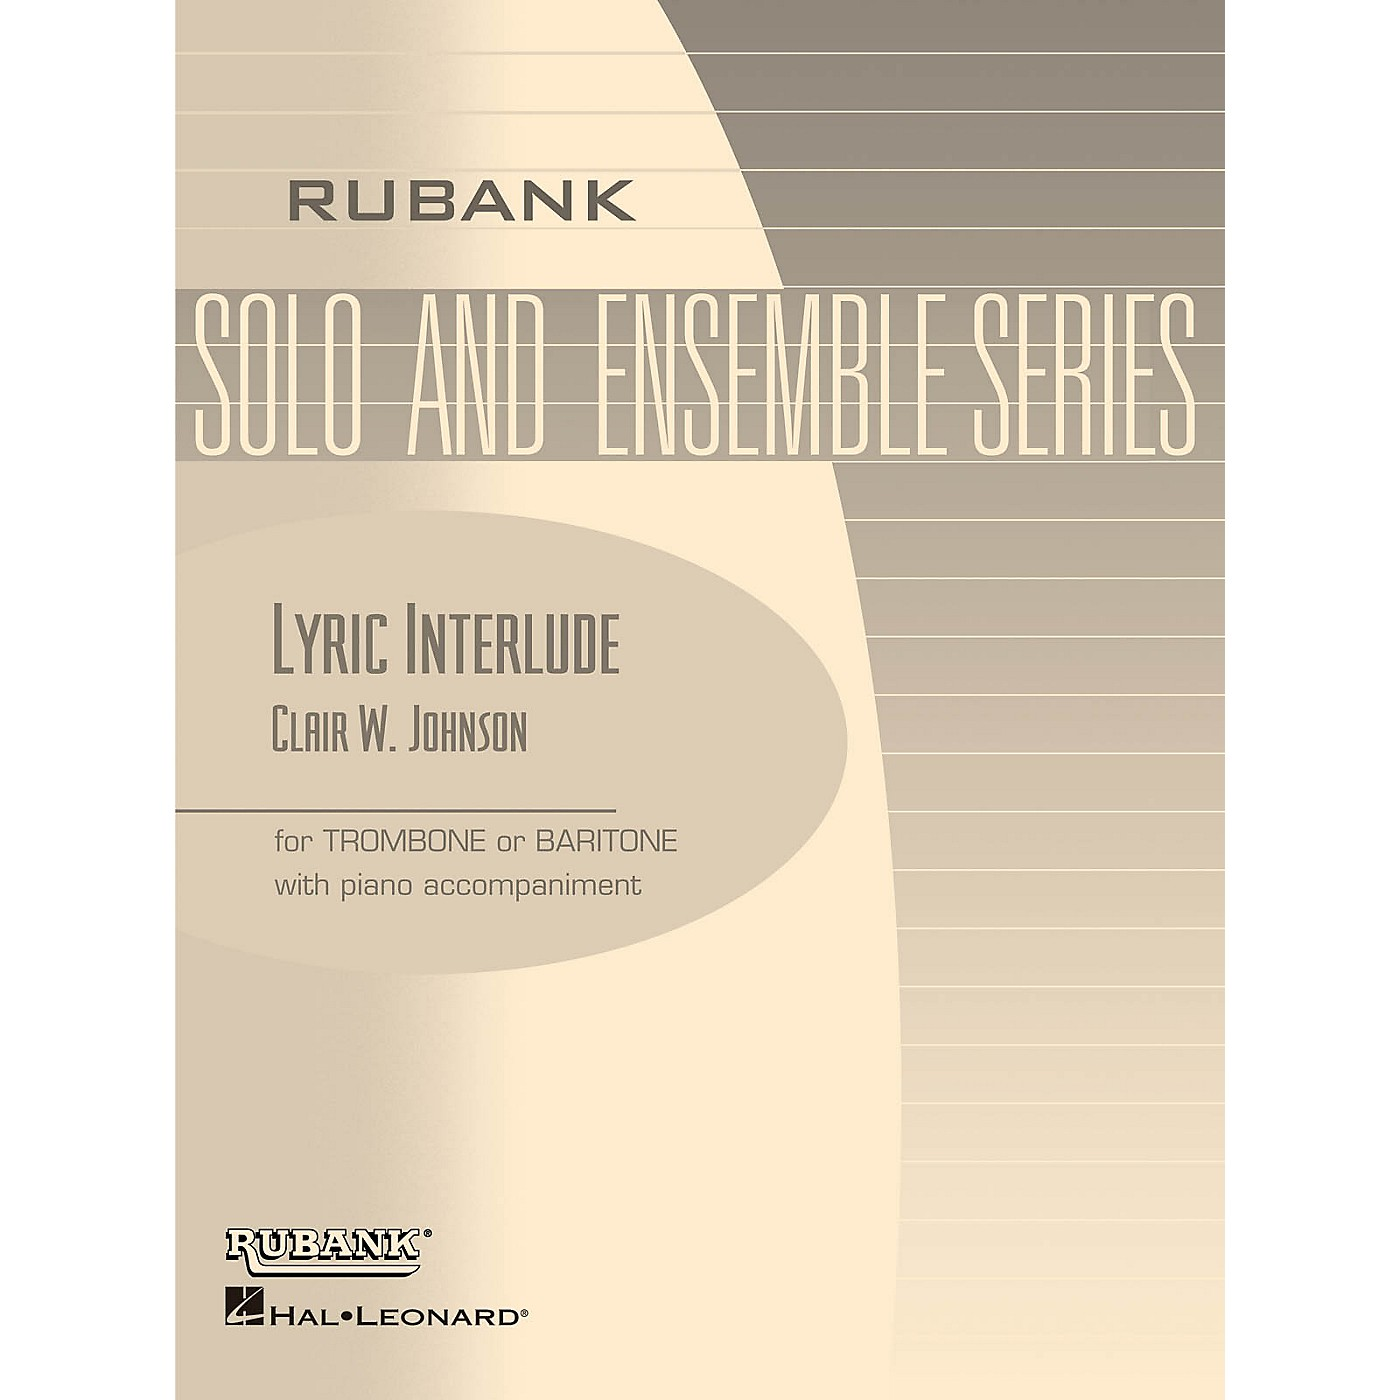 Rubank Publications Lyric Interlude (Trombone/Baritone (B.C. or T.C.) with Piano - Grade 3) Rubank Solo/Ensemble Sheet Series thumbnail